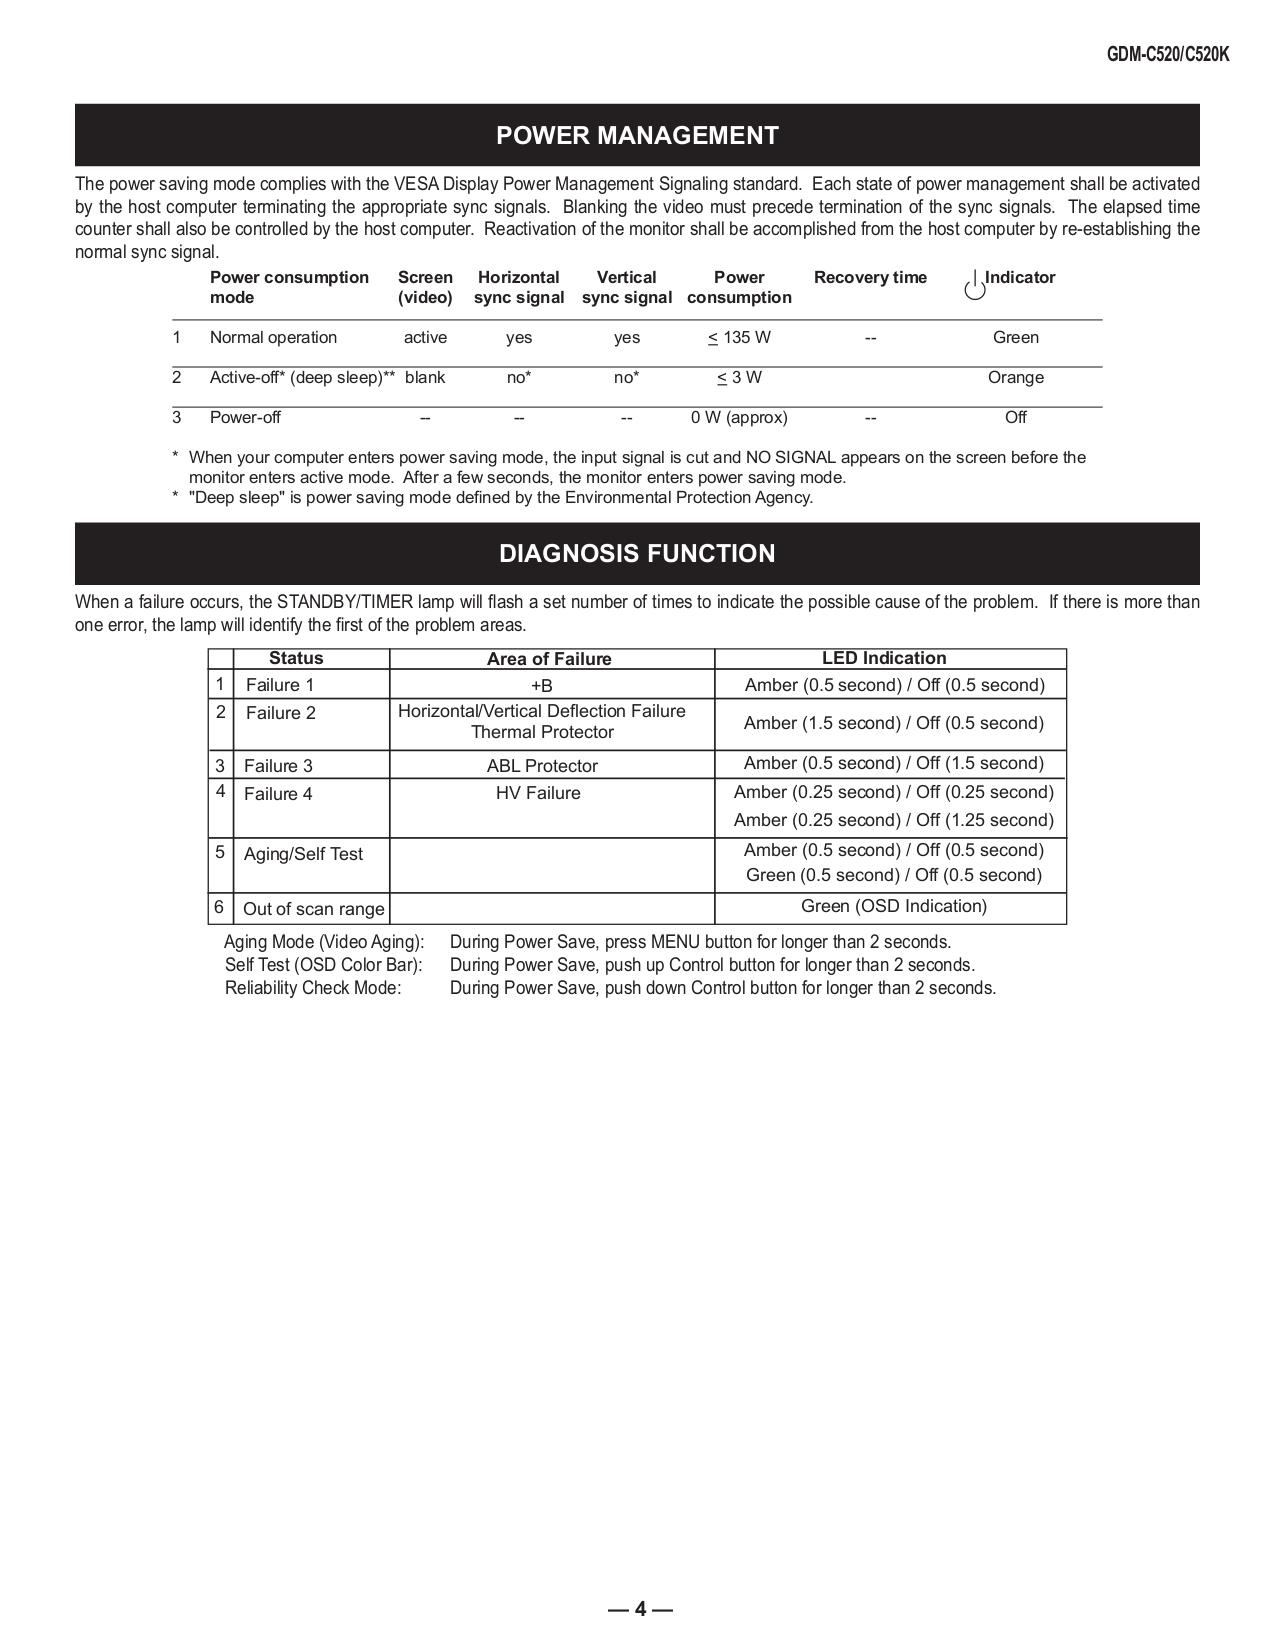 PDF manual for Sony Monitor GDM-C520K